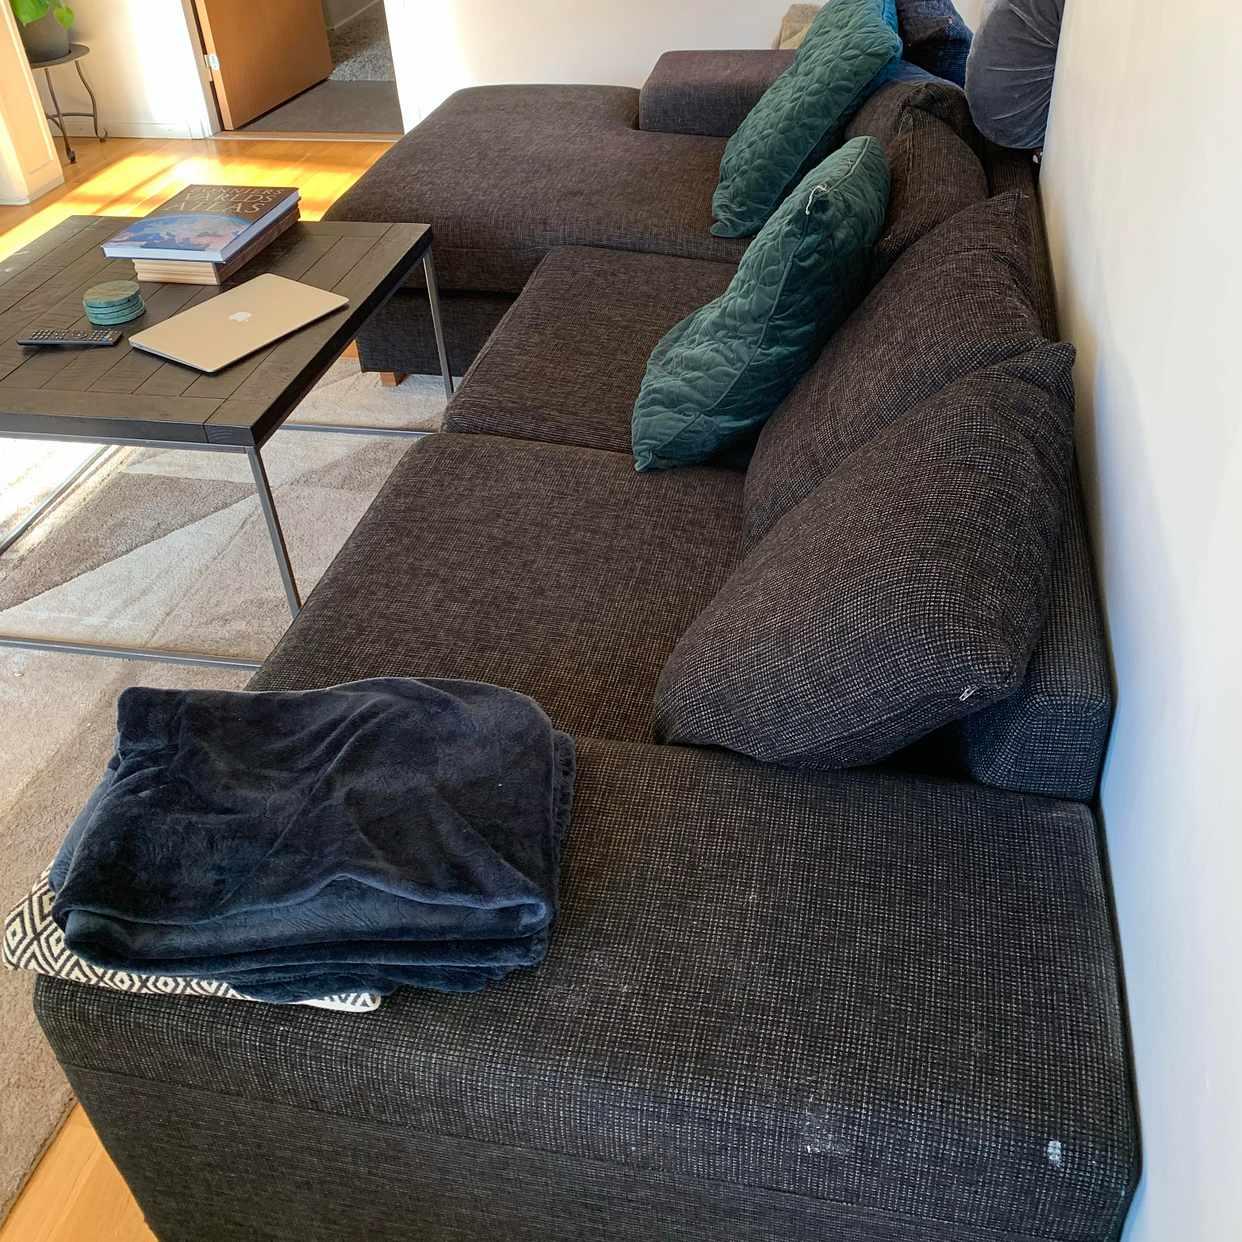 image of Forsla bort soffan - Bromma